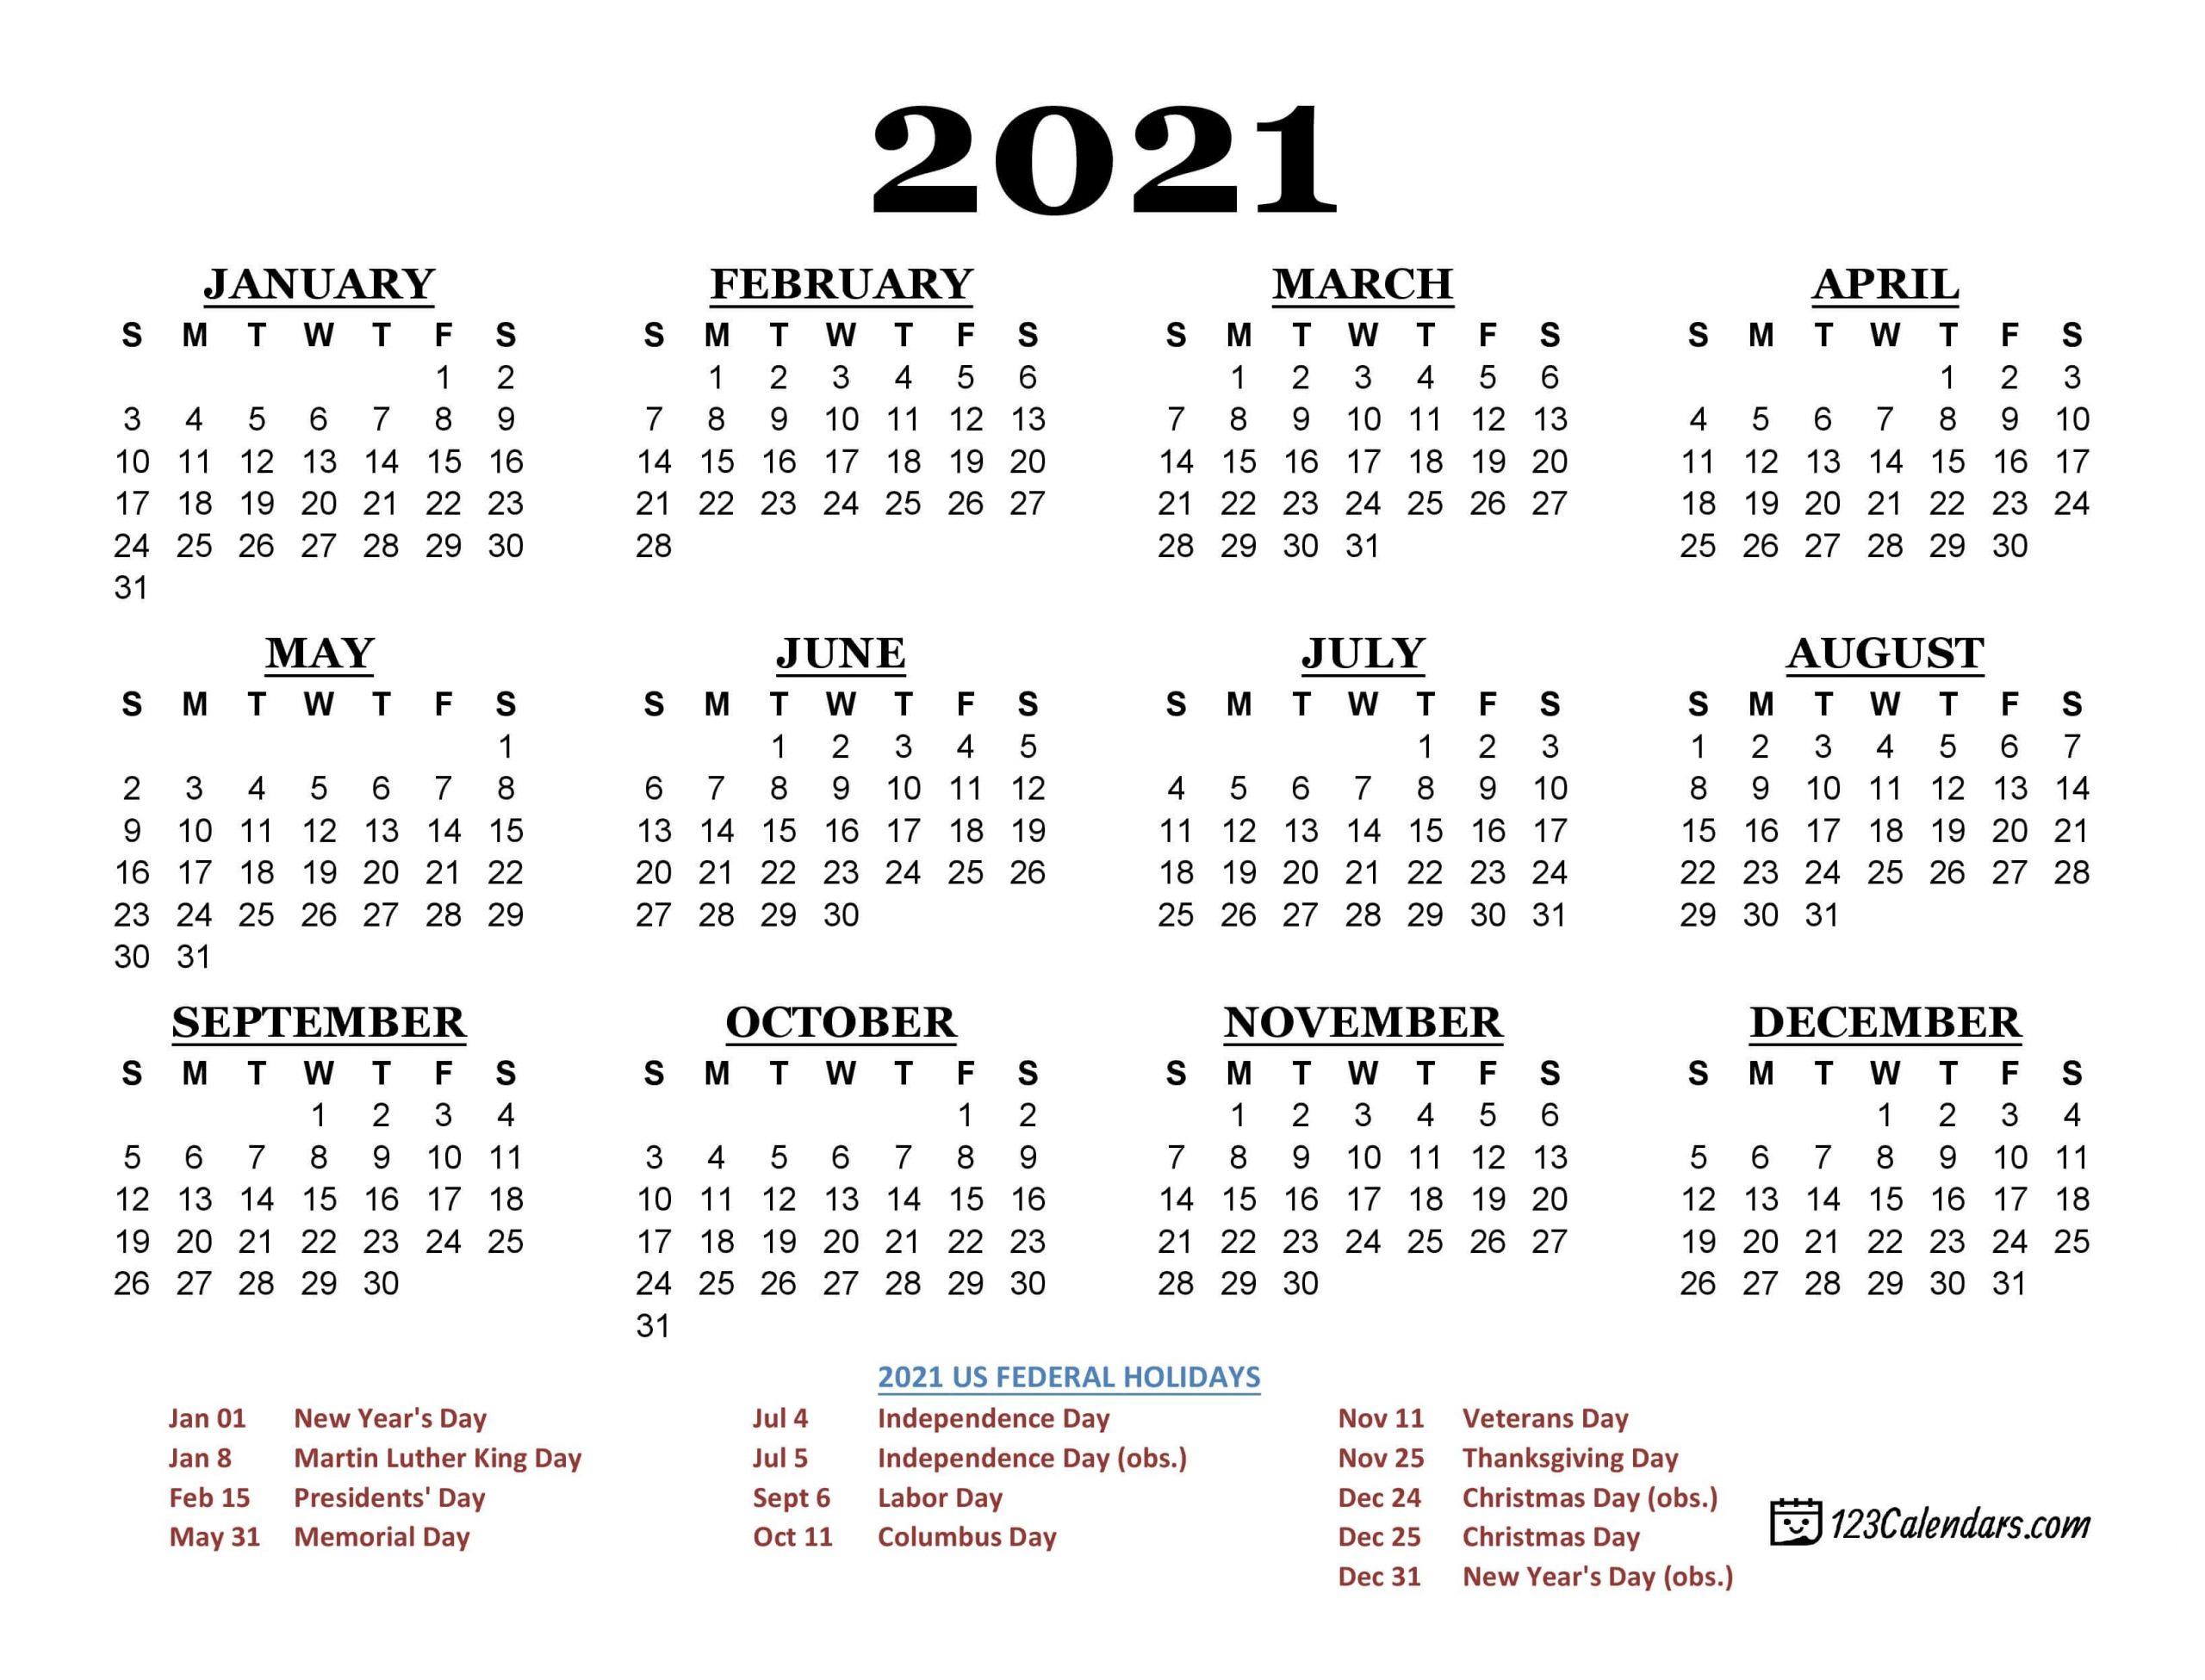 2021 Printable Calendar | 123Calendars-Print Philippine 2021 Calendars With Holiday